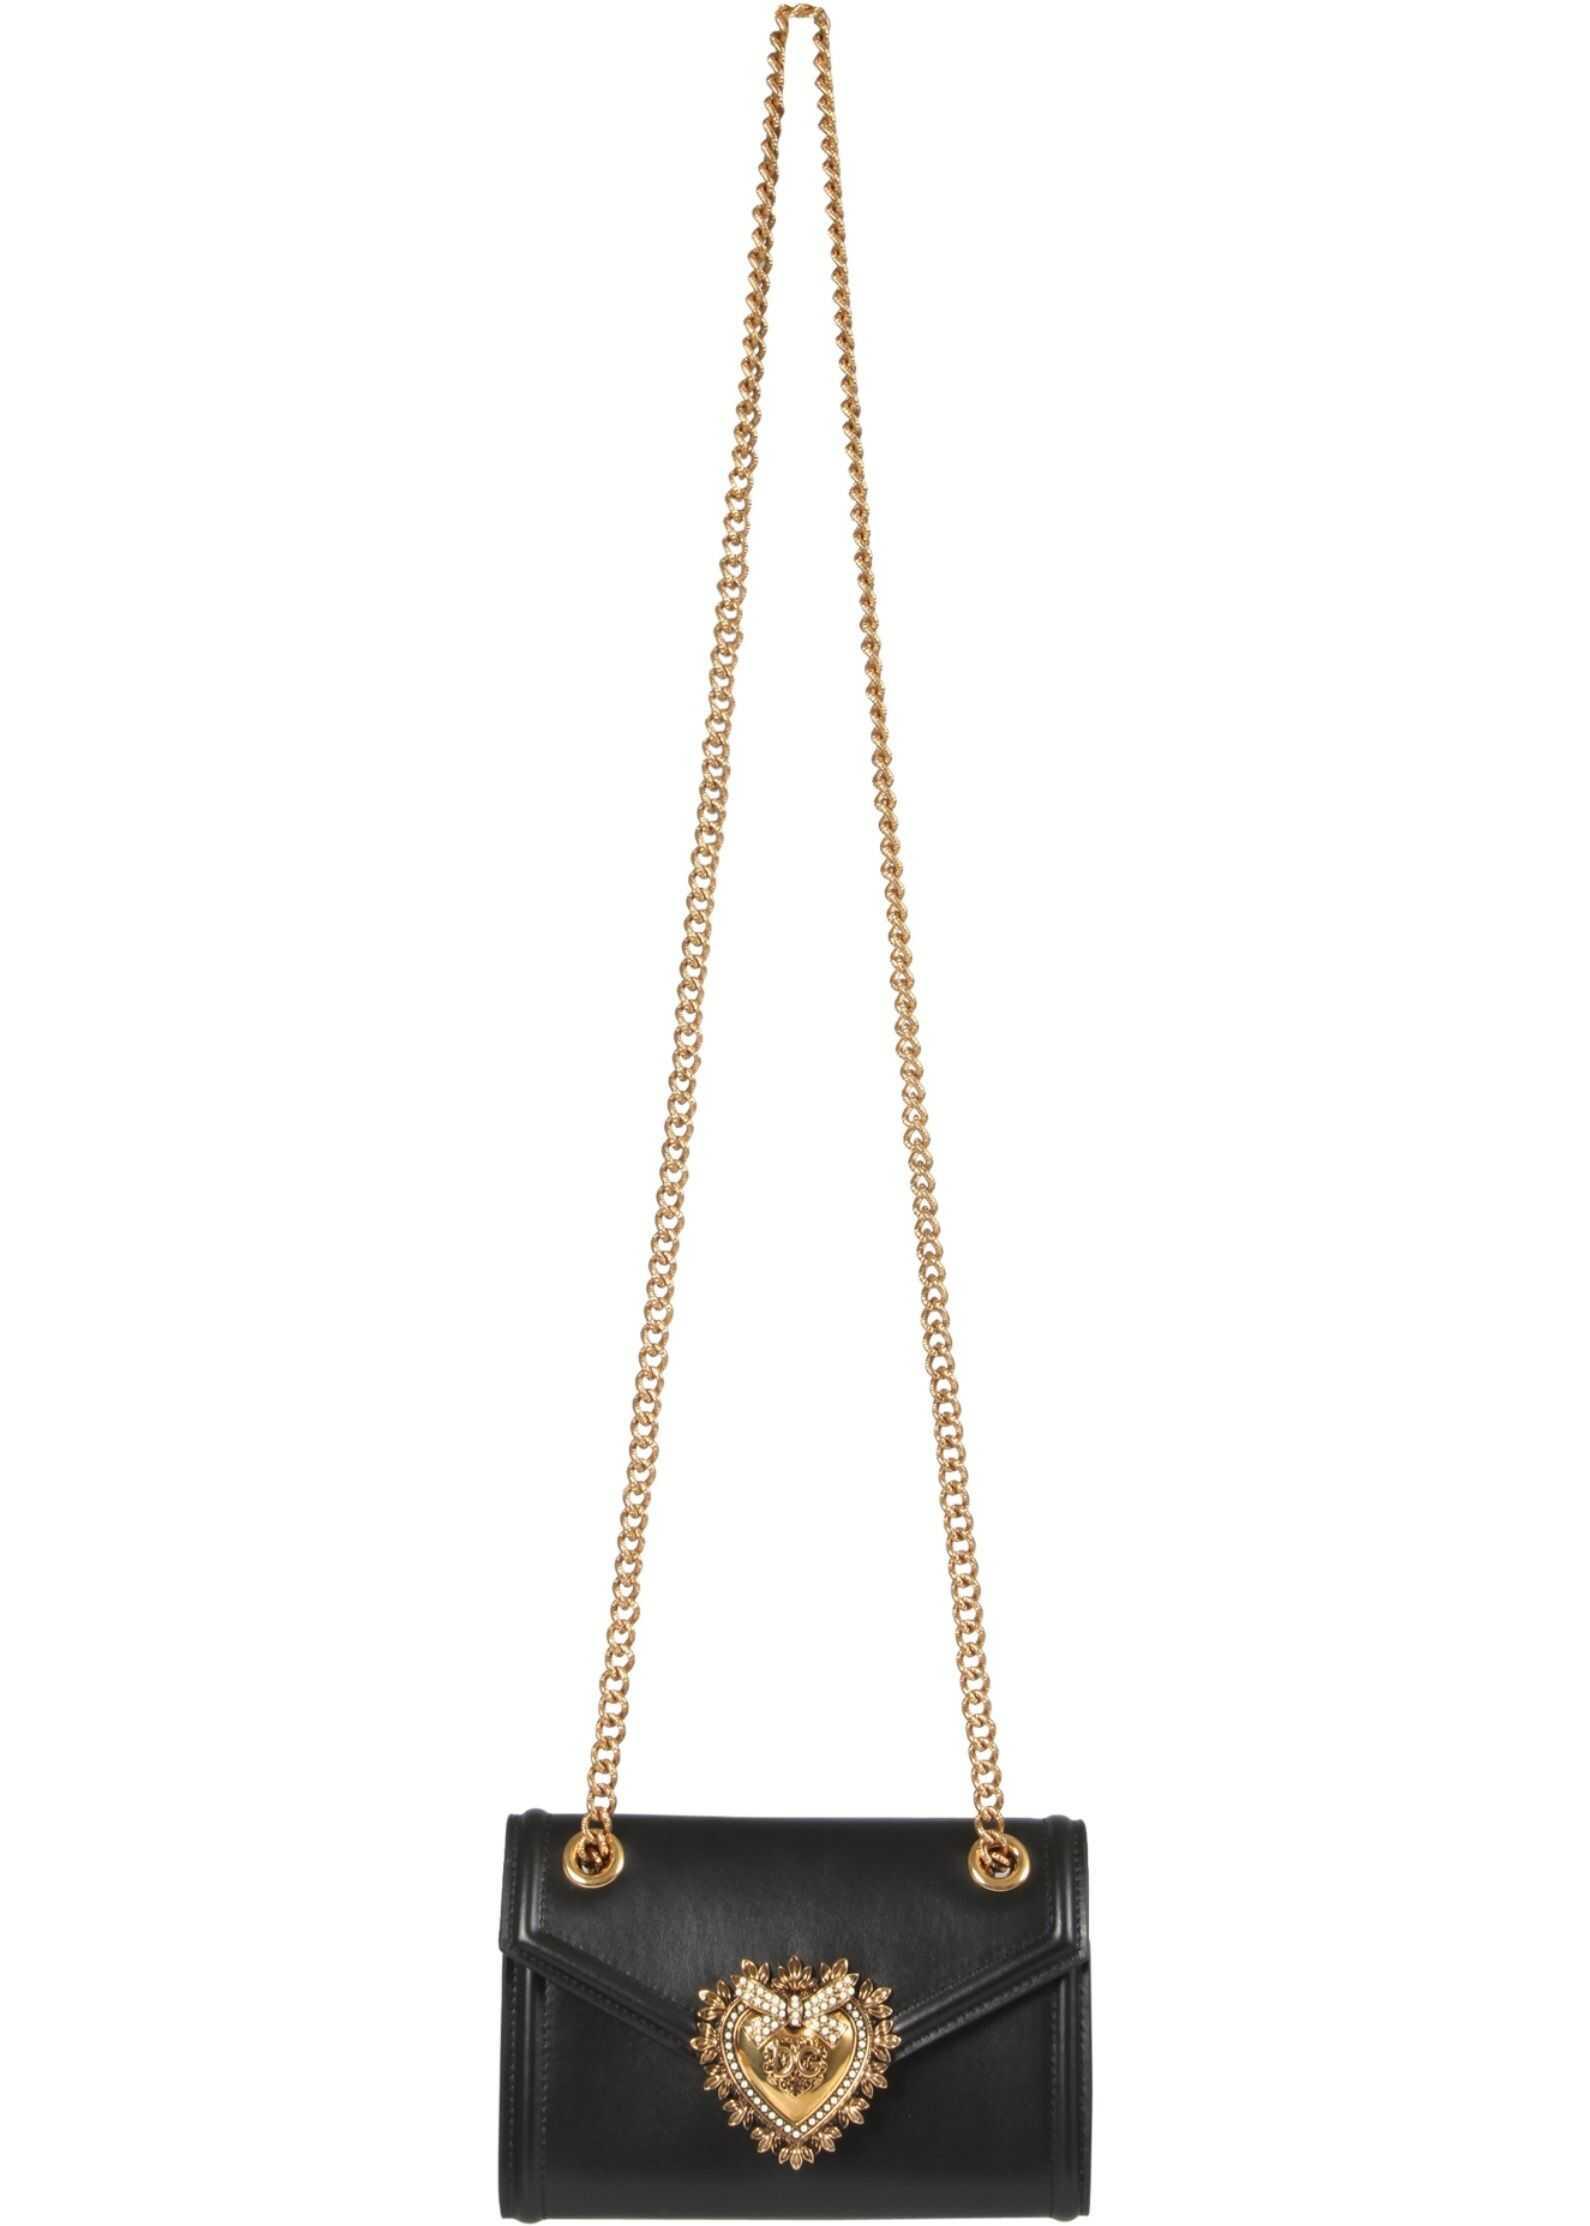 Dolce & Gabbana Mini Devotion Bag BI1168_AV89380999 BLACK imagine b-mall.ro